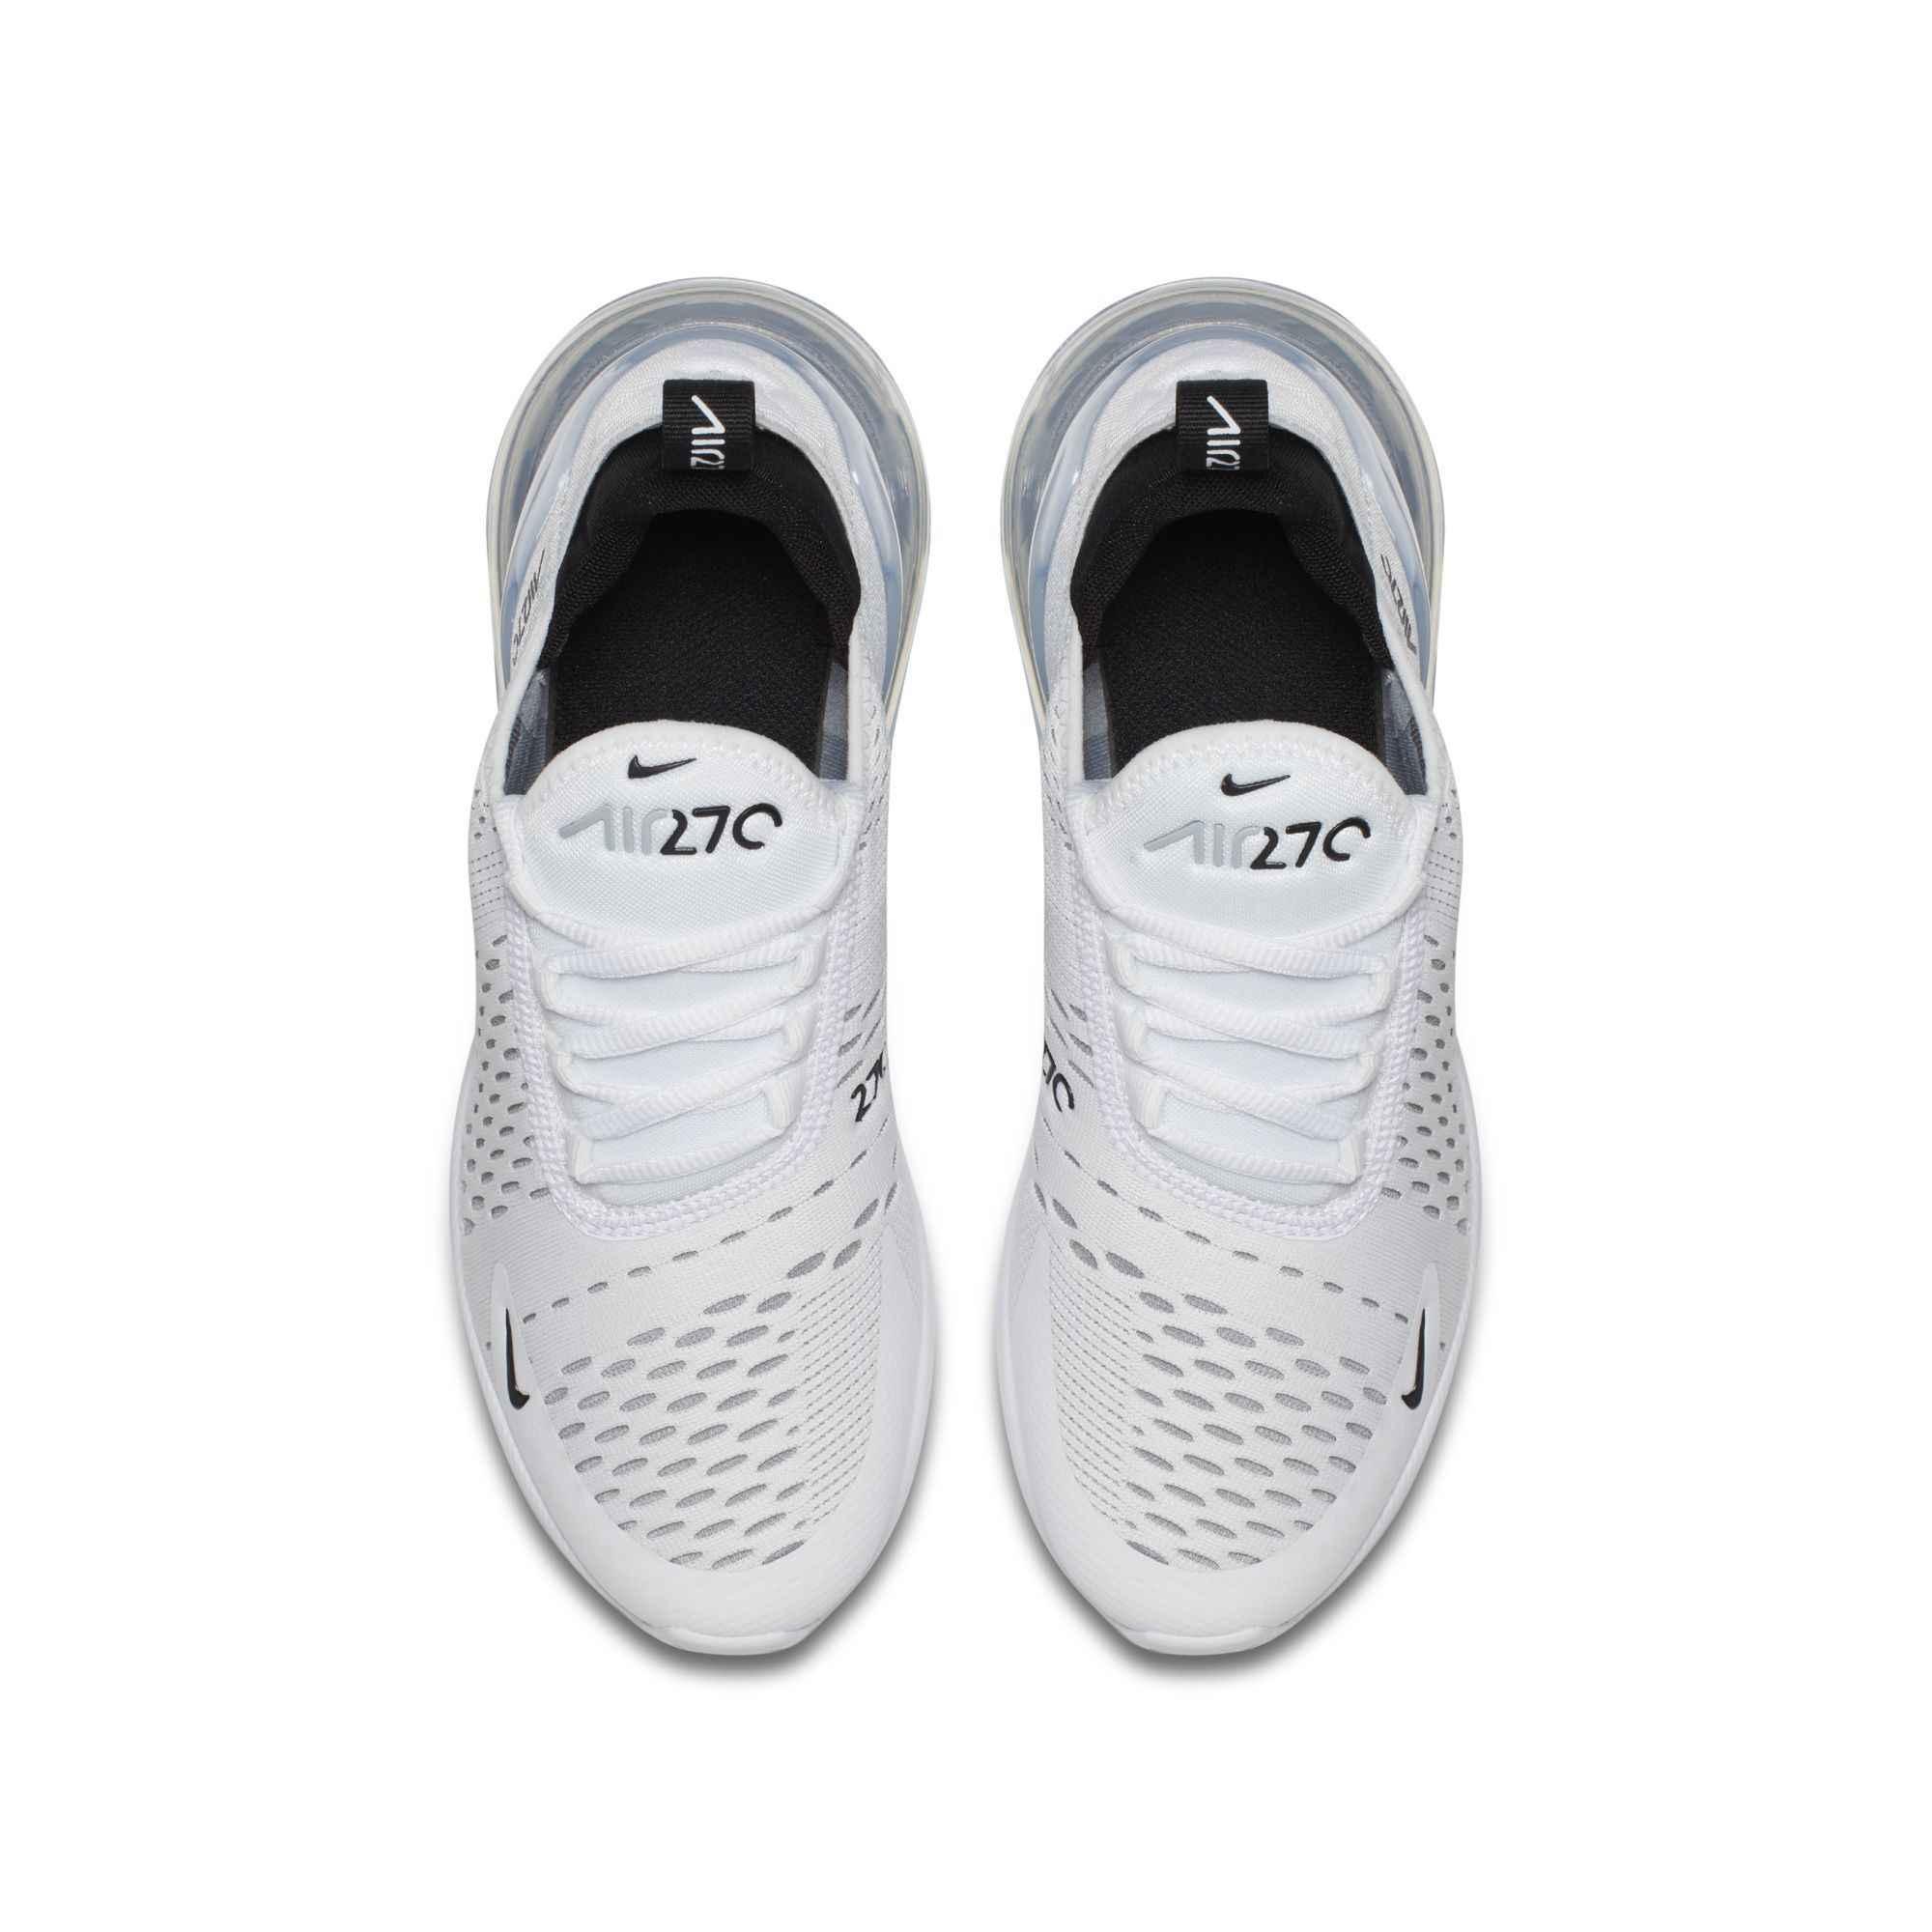 88615f67 ... Nike Official Air Max 270 (gs) Will Child Motion детские обувь  напольная, Удобная ...